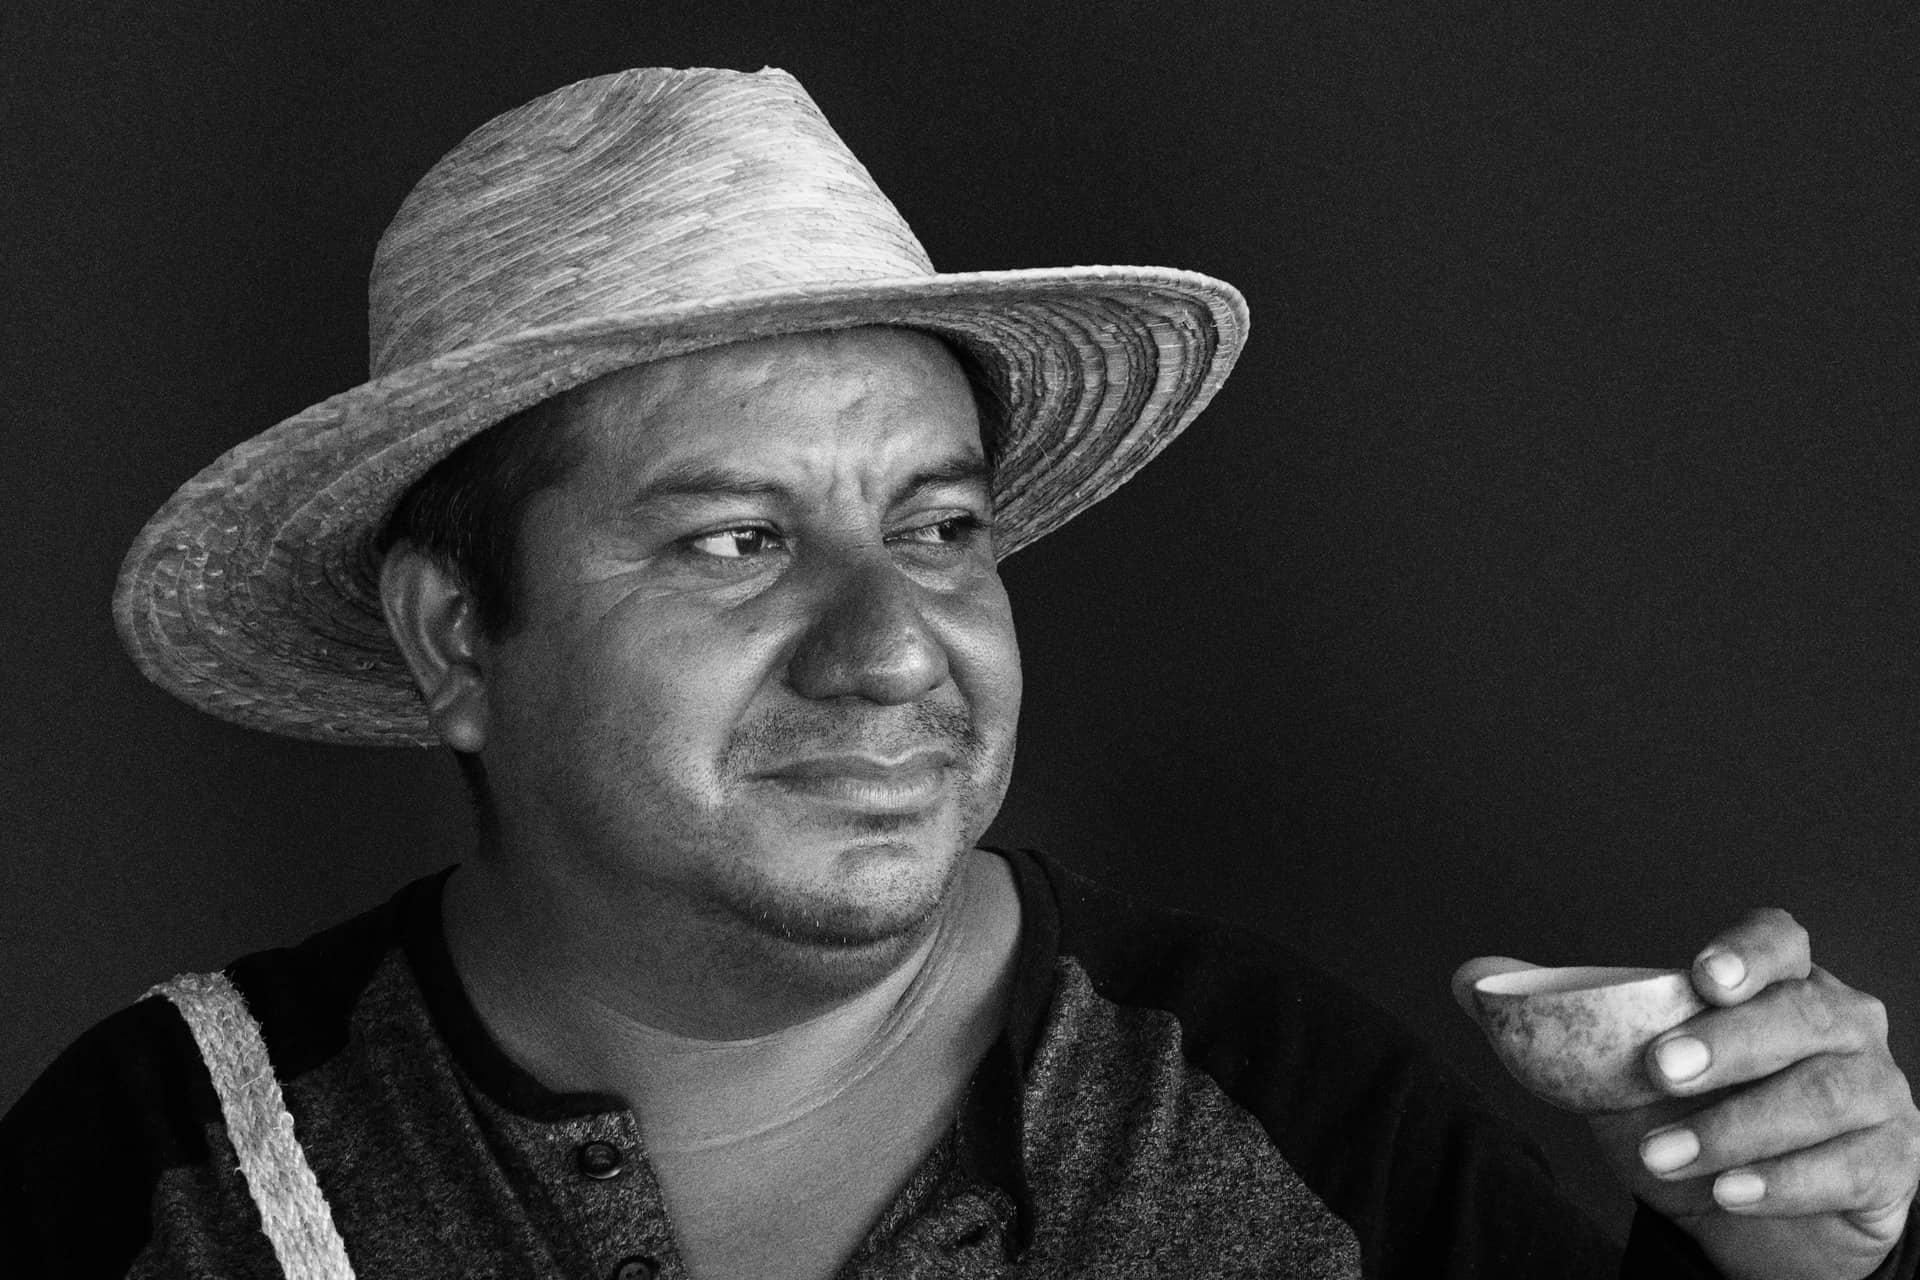 Jaime Morales Aquino